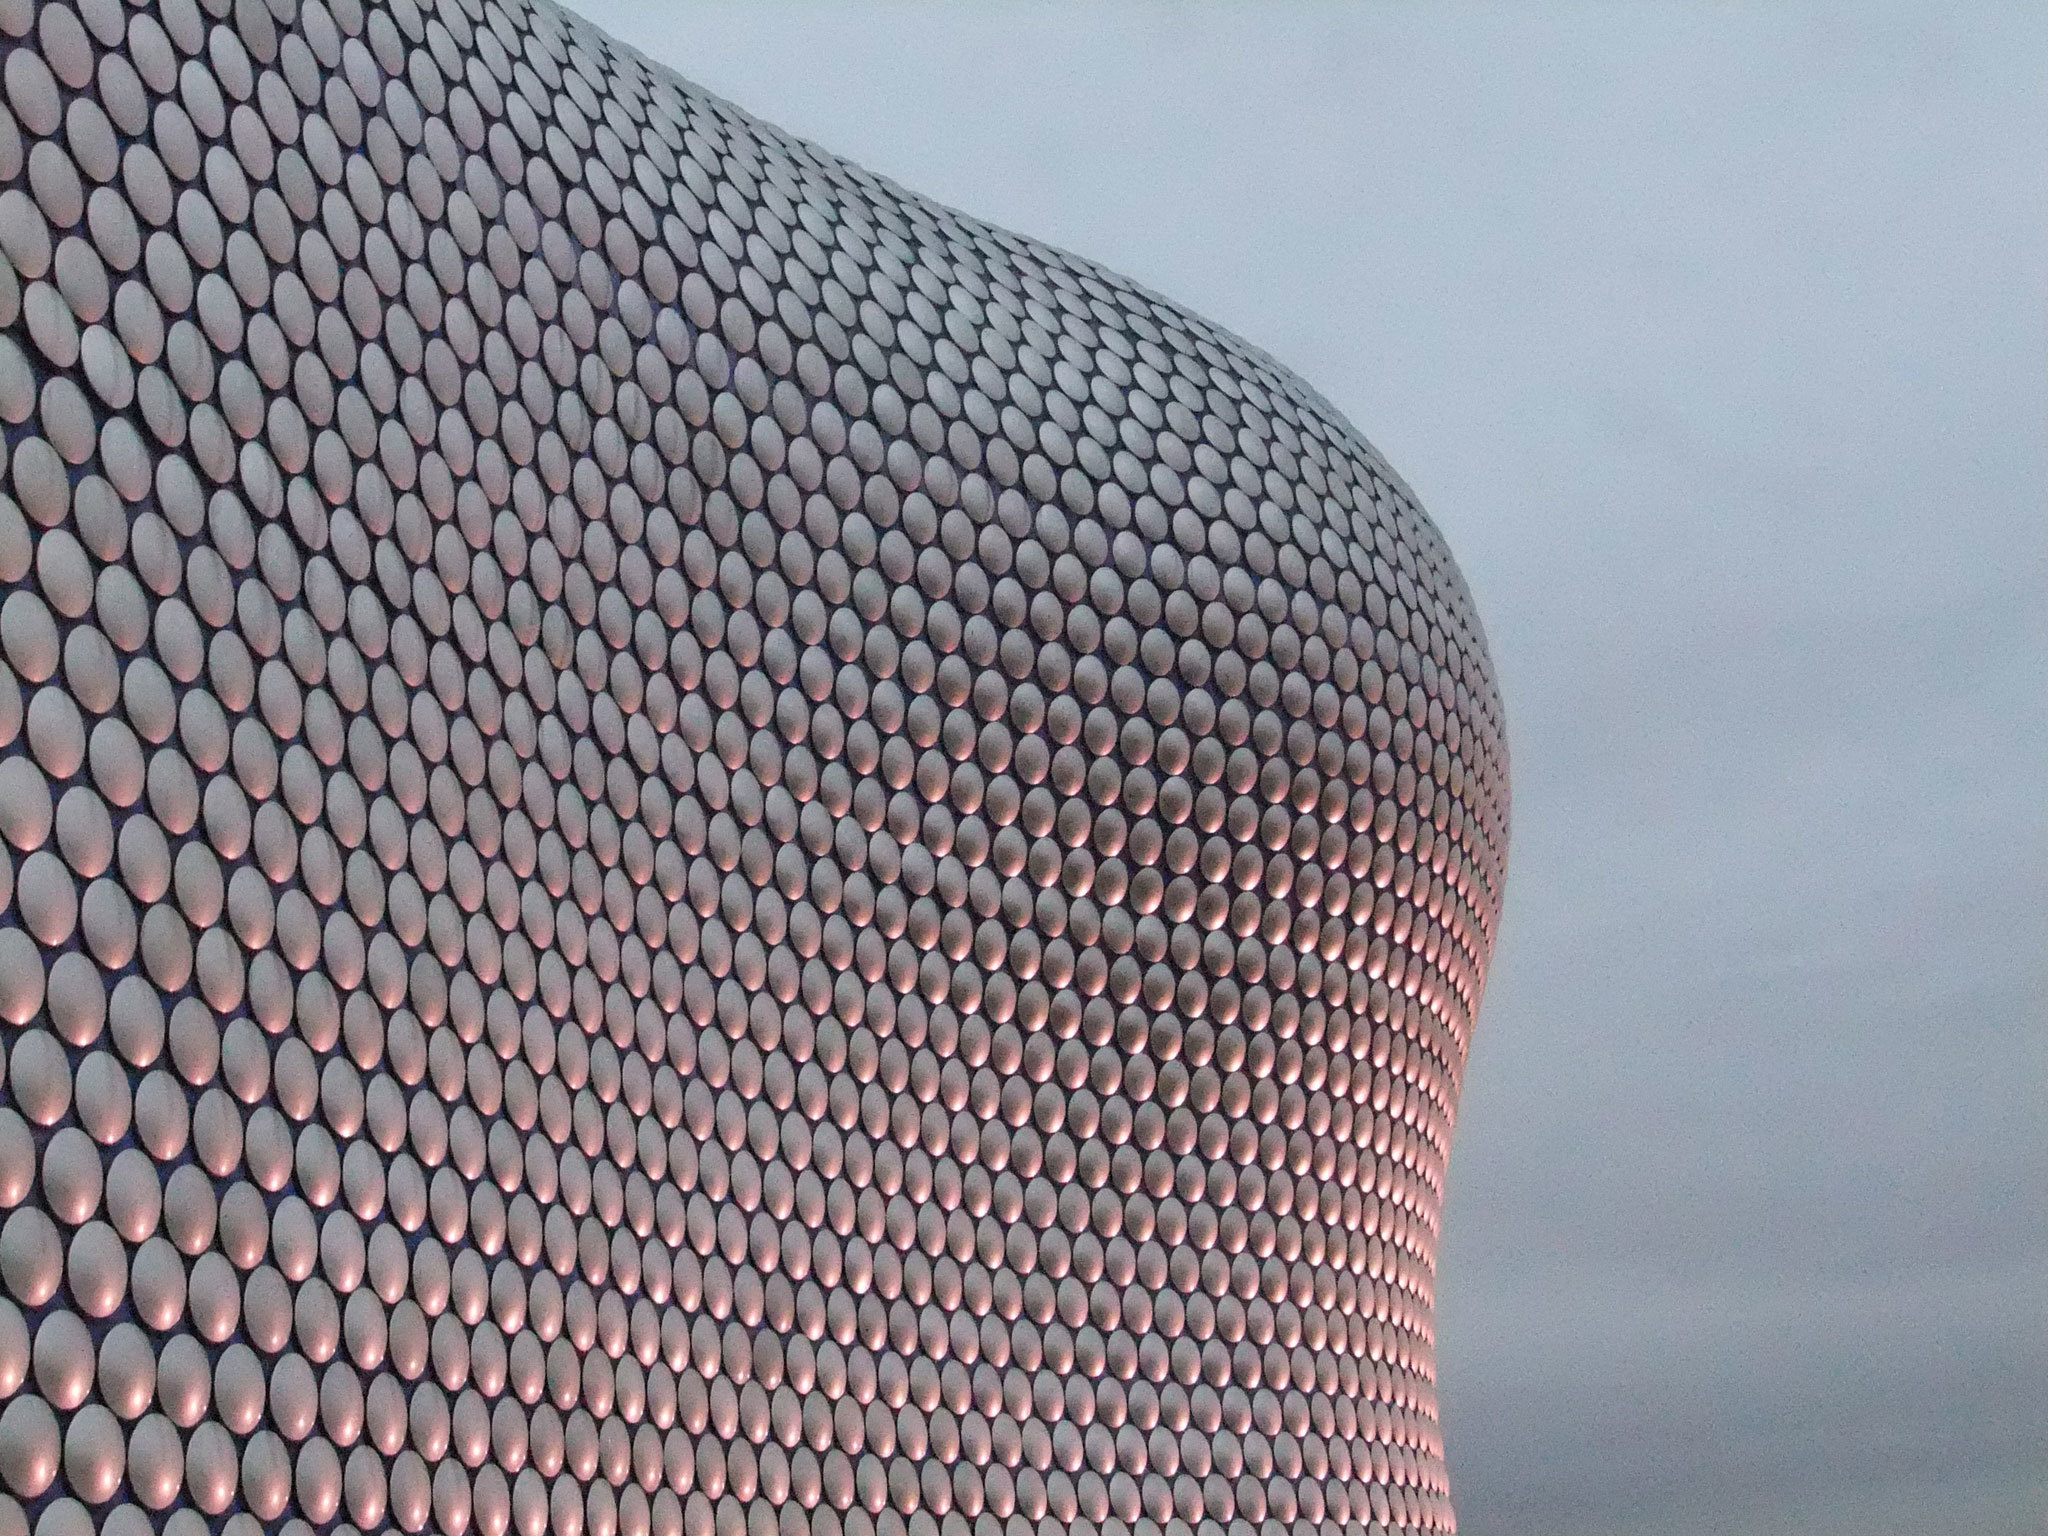 Bullring in Birmingham at sunset